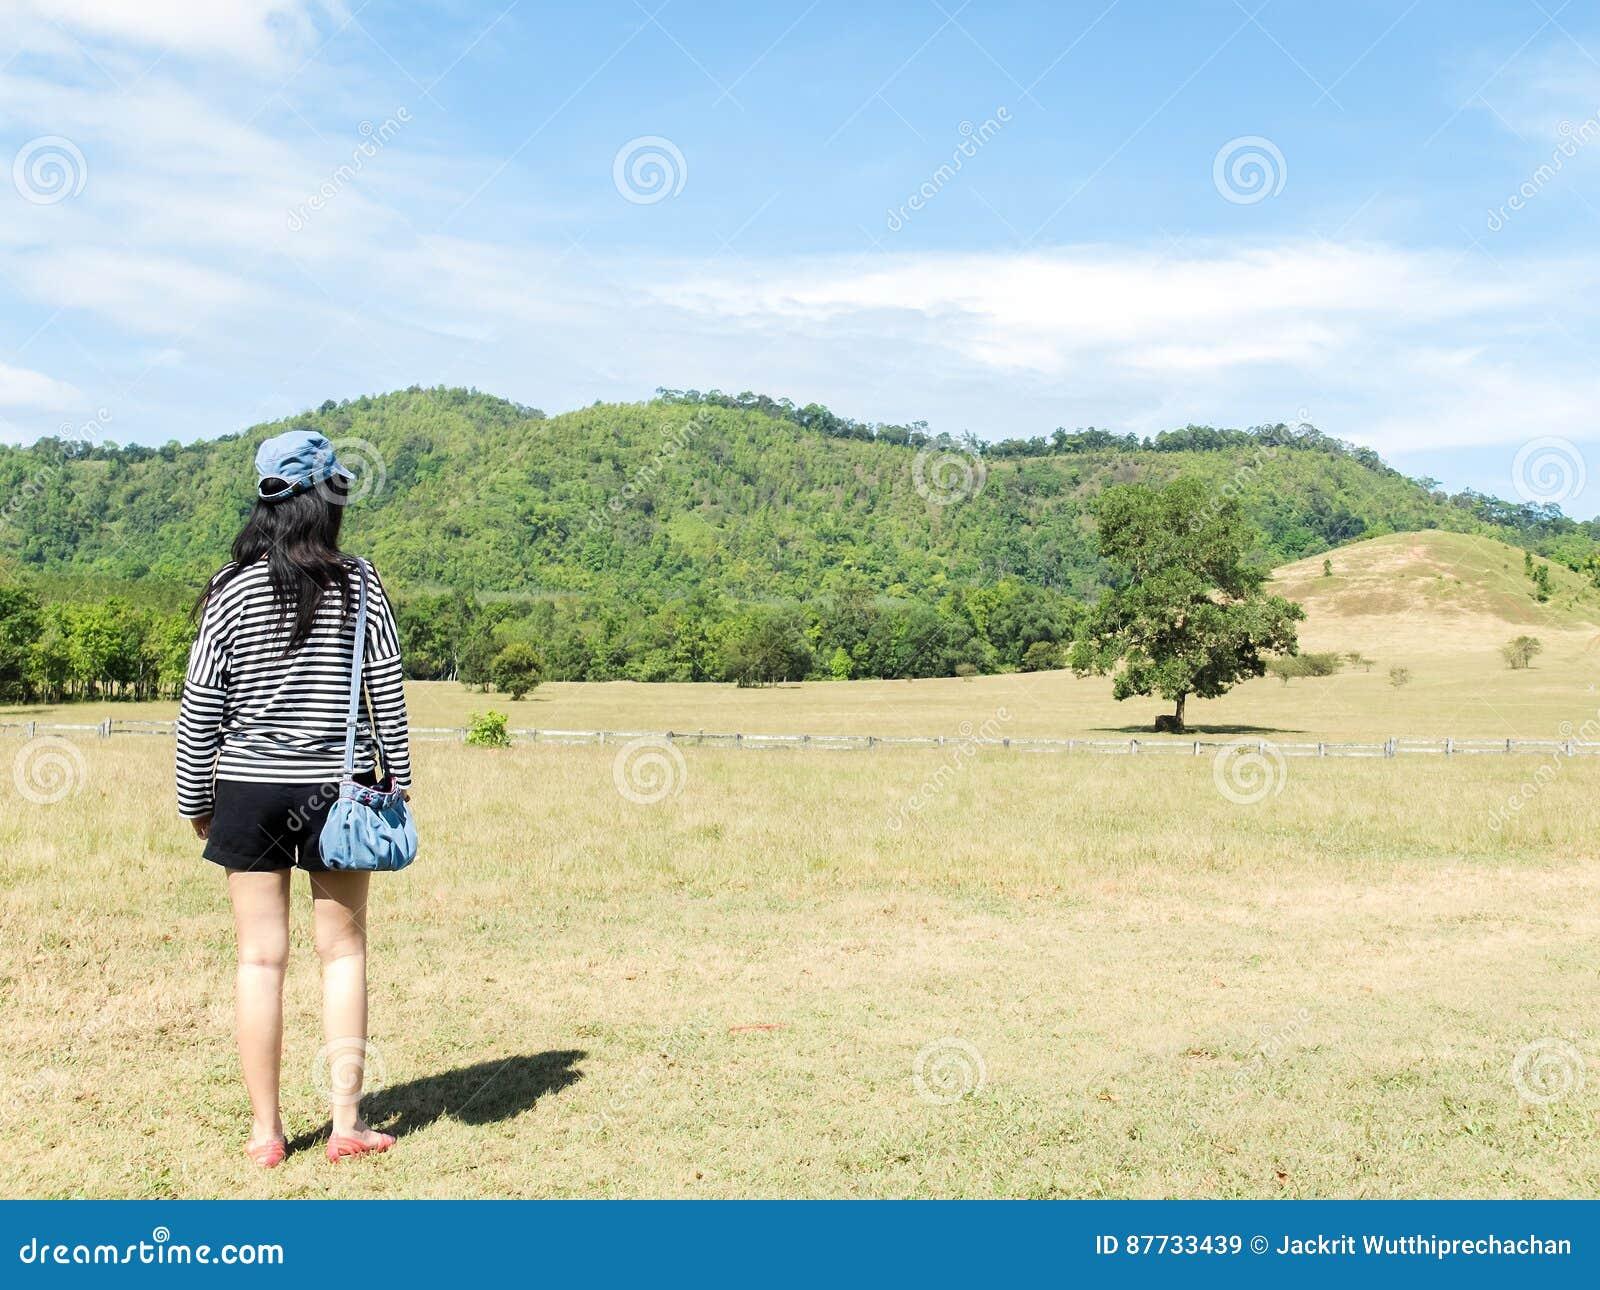 b134b91380 Ευτυχής όμορφη ασιατική γυναίκα με το καπέλο και τσάντα έτοιμη να αρχίσει  τις διακοπές στη γωνία με τη φύση βουνών τοπίου στο υπόβαθρο Πηγαίνετε  έννοια ...